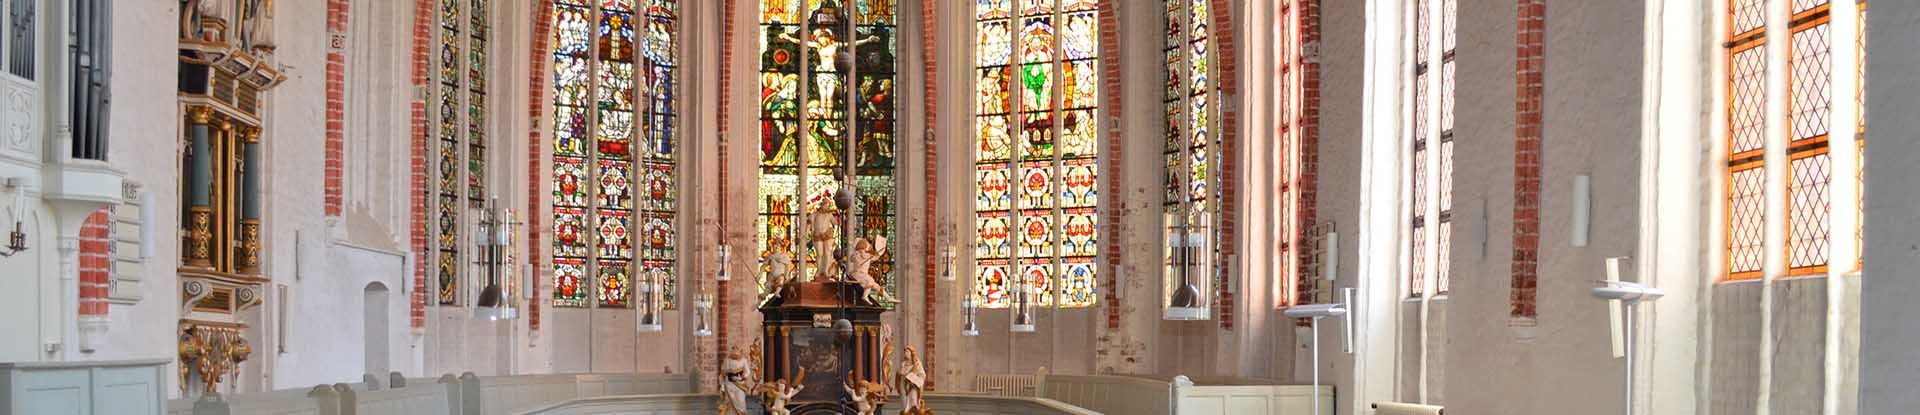 Kirche im Kloster Ebstorf